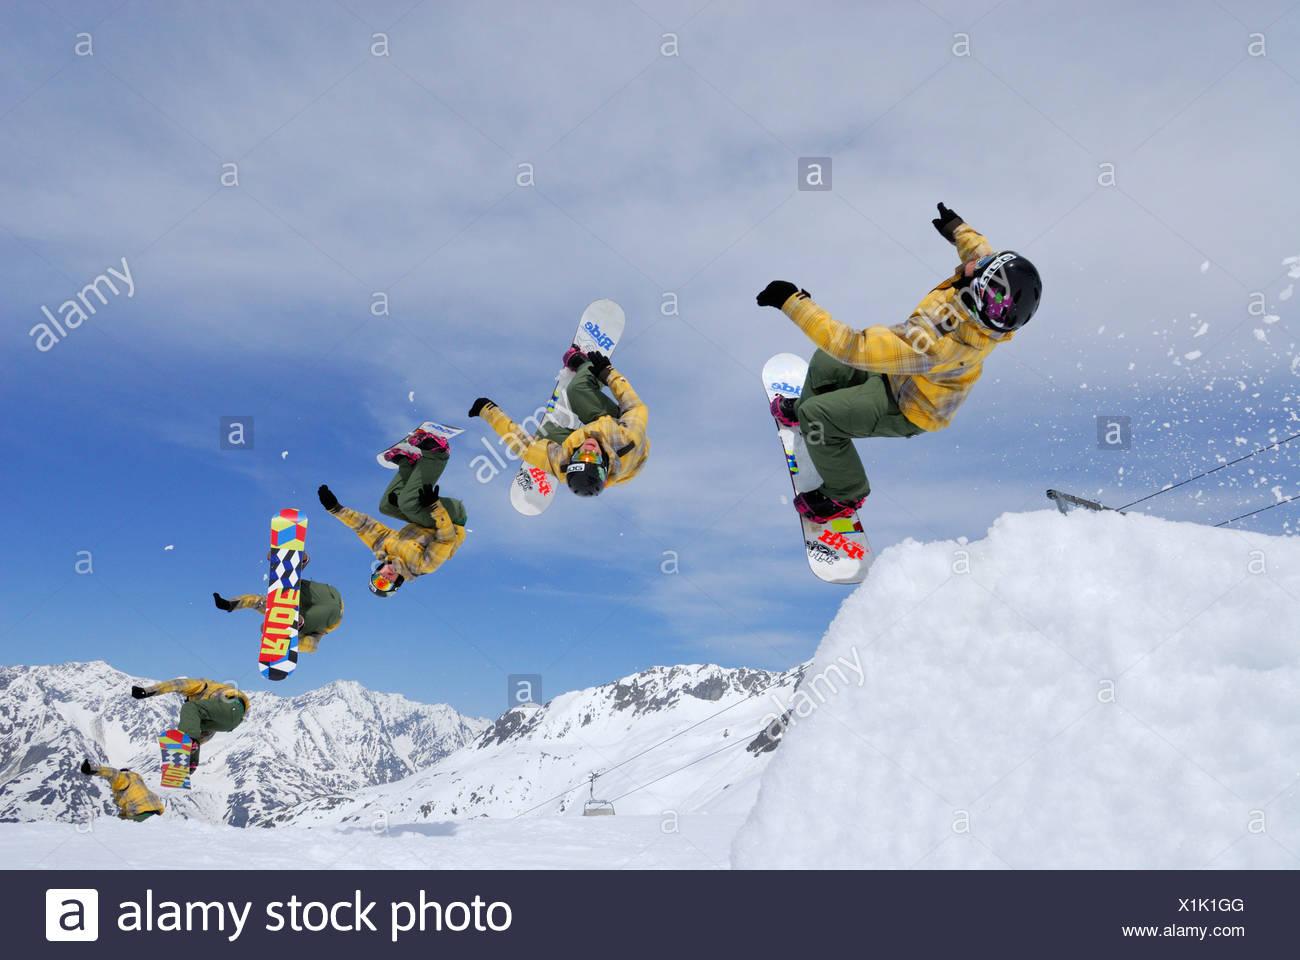 Snowboarder in mid-air, back-flip, multiple image, ski area Soelden, Oetztal, Tyrol, Austria - Stock Image